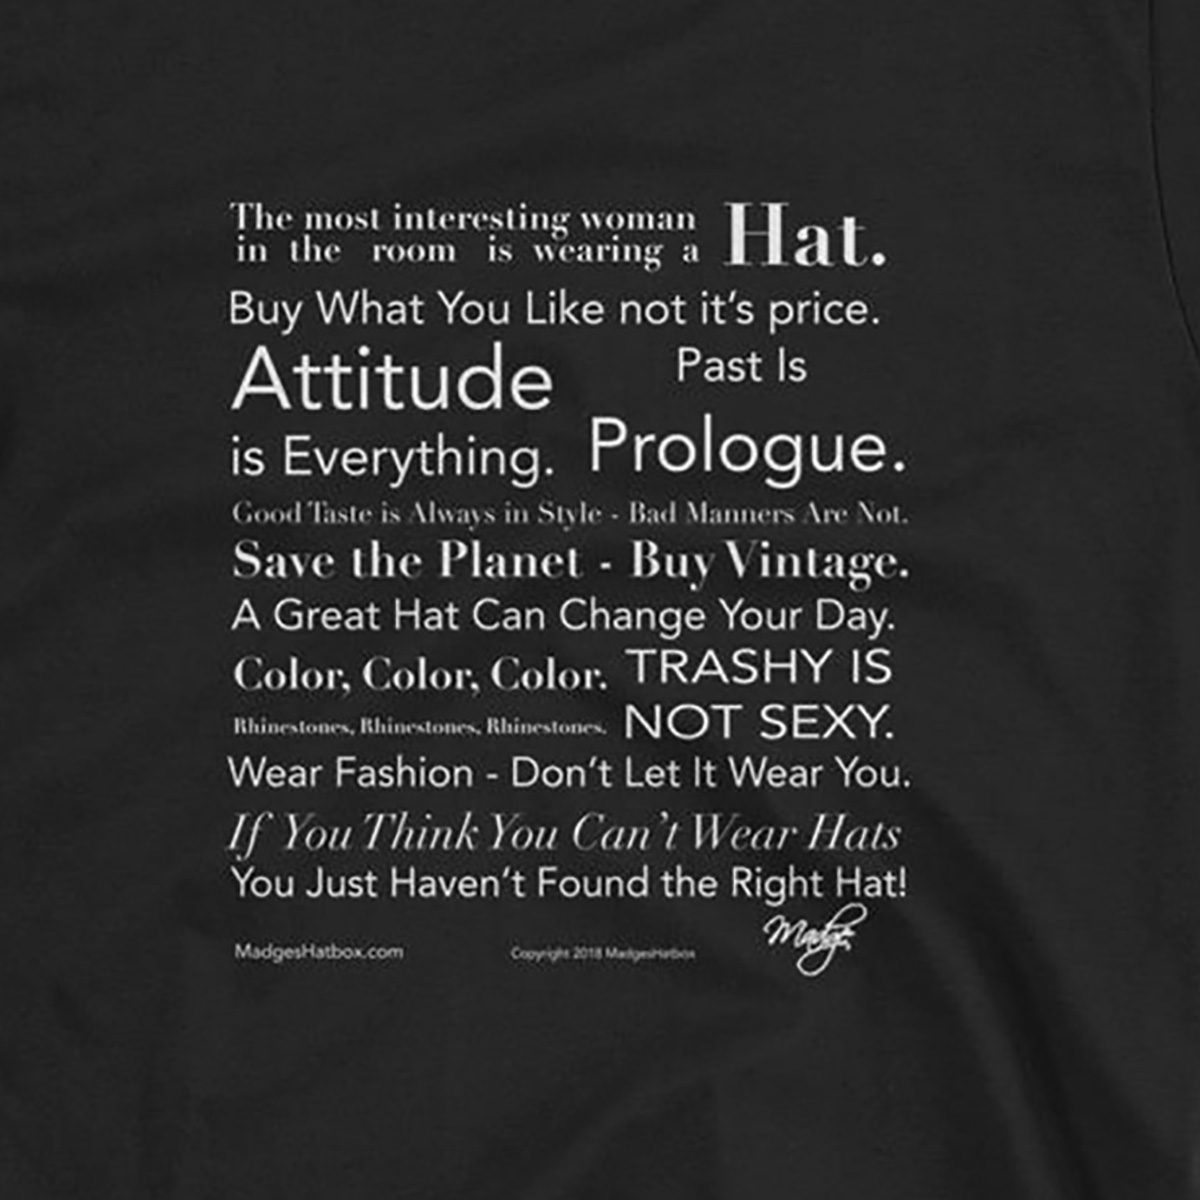 MadgesHatbox t-shirt